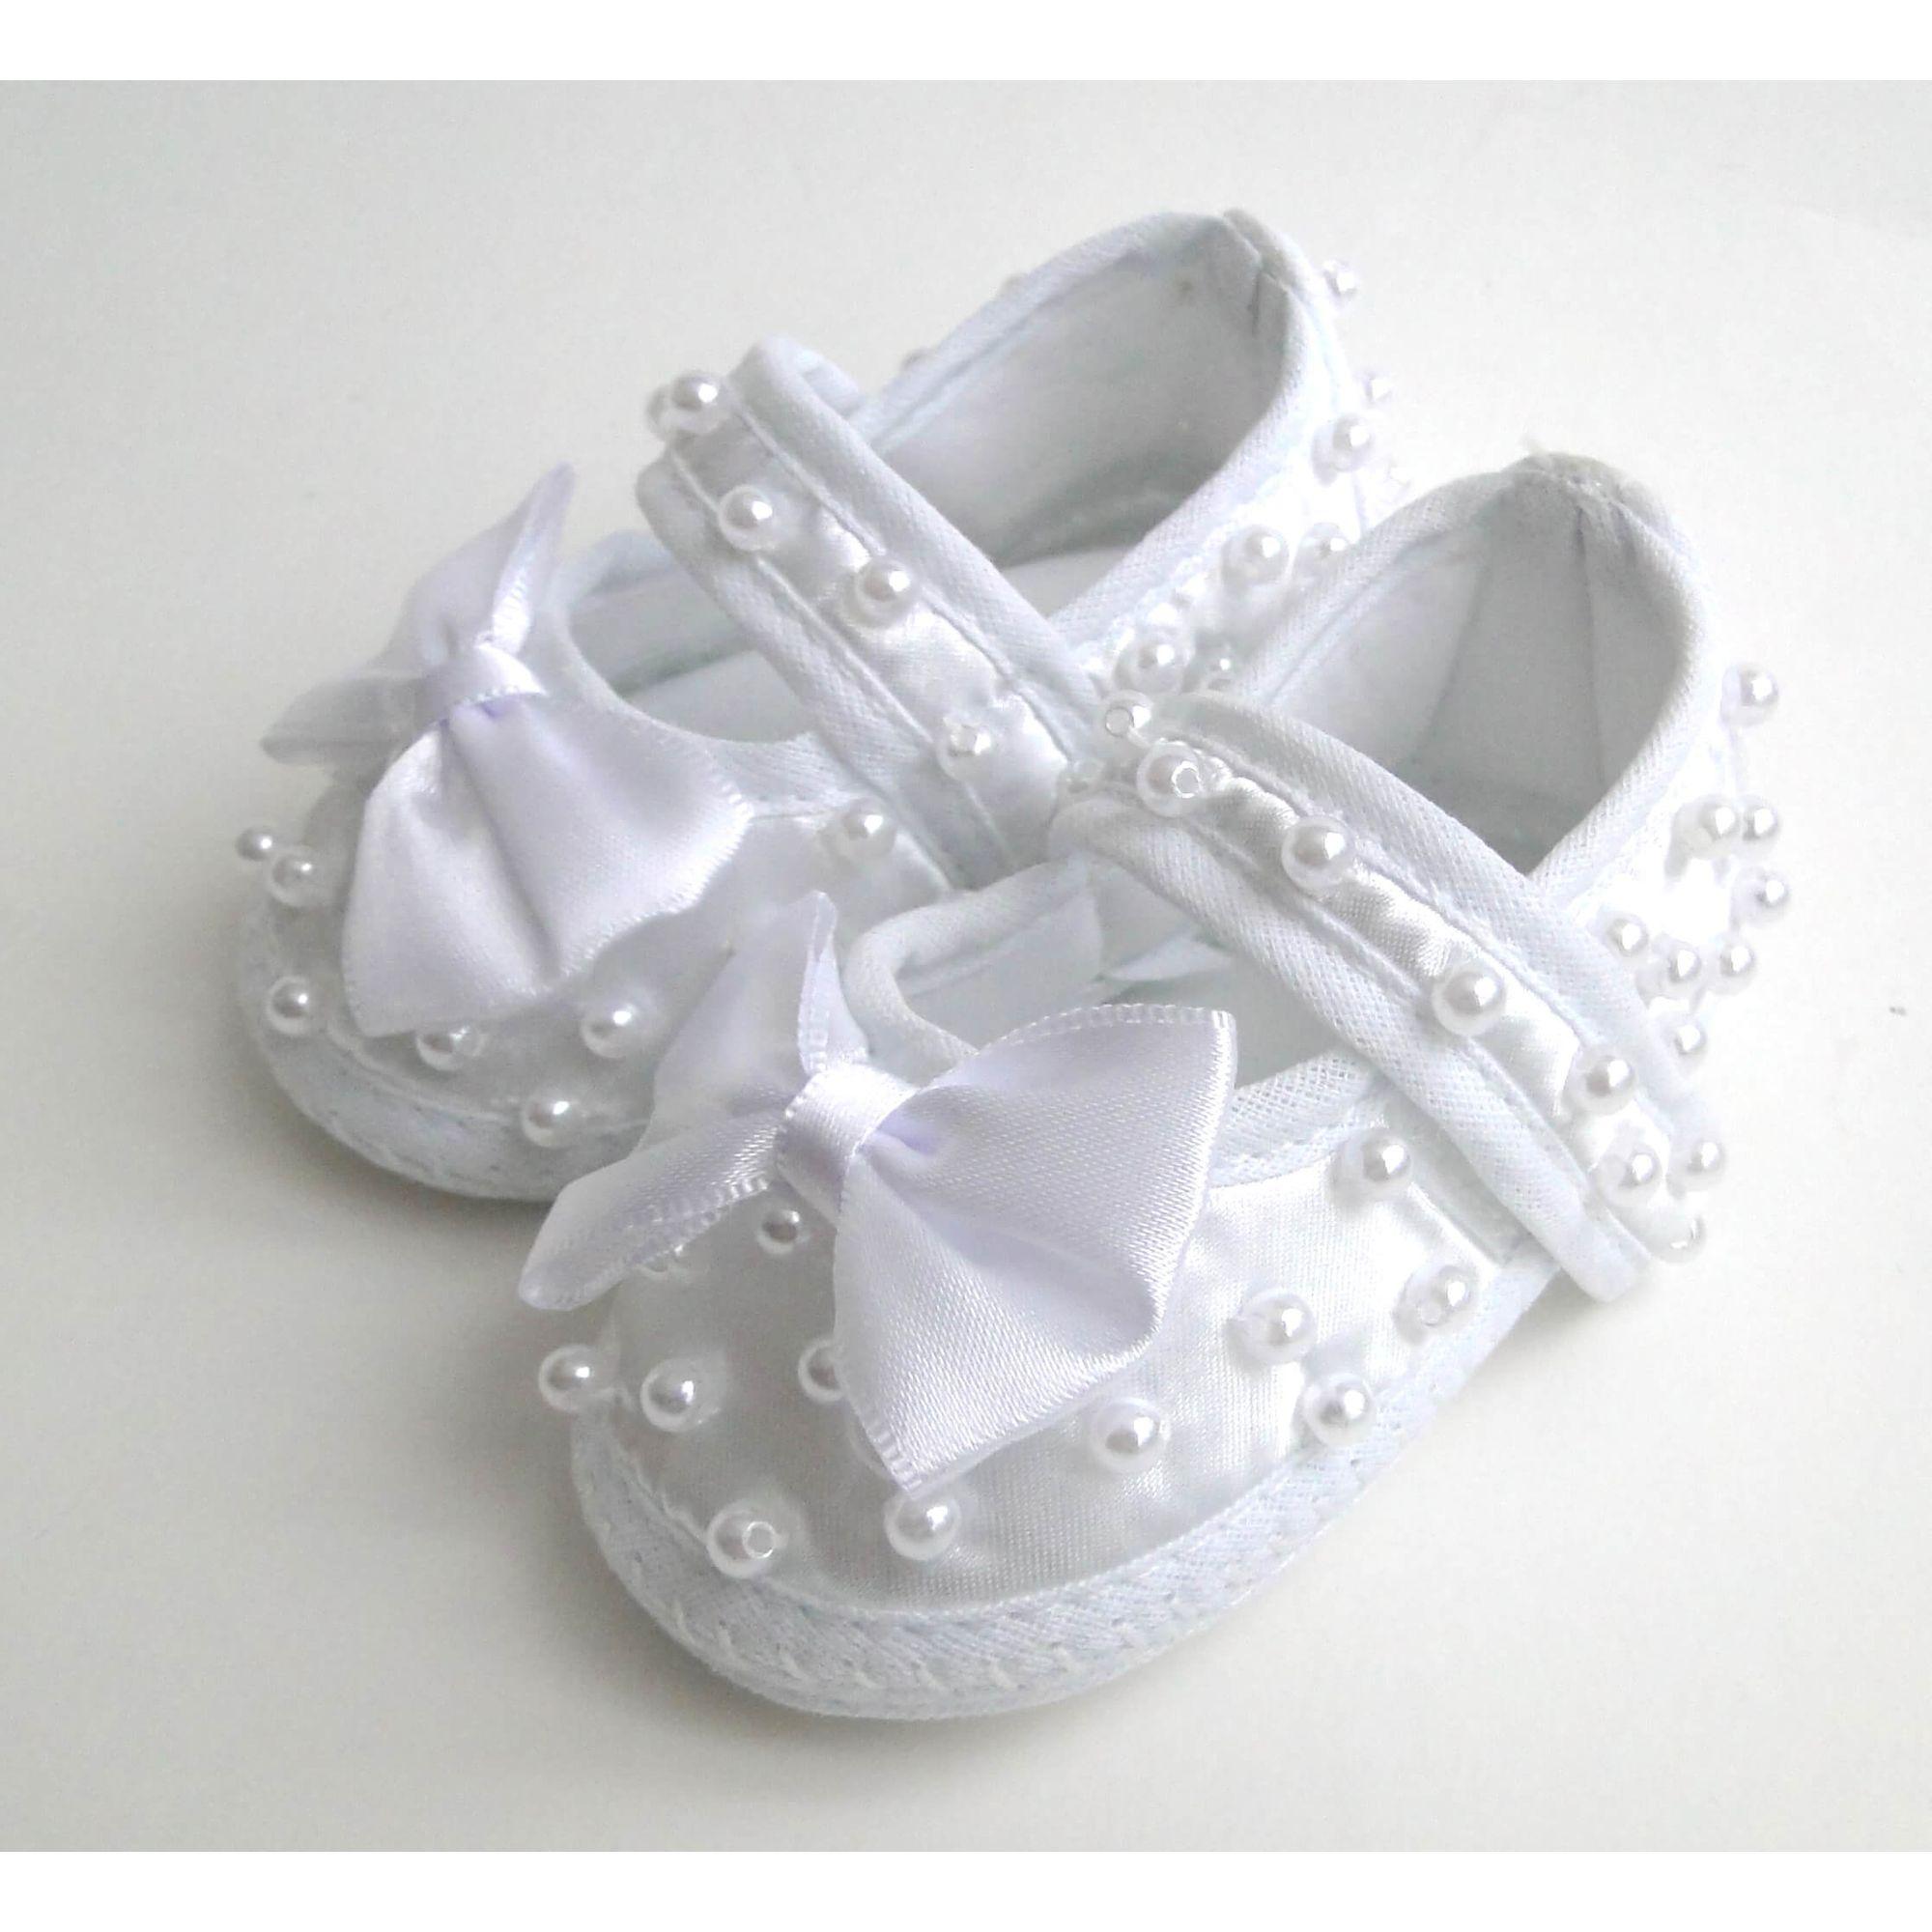 sapatilha-bebe-cetim-branco-perolas-e-laco-frontal-1